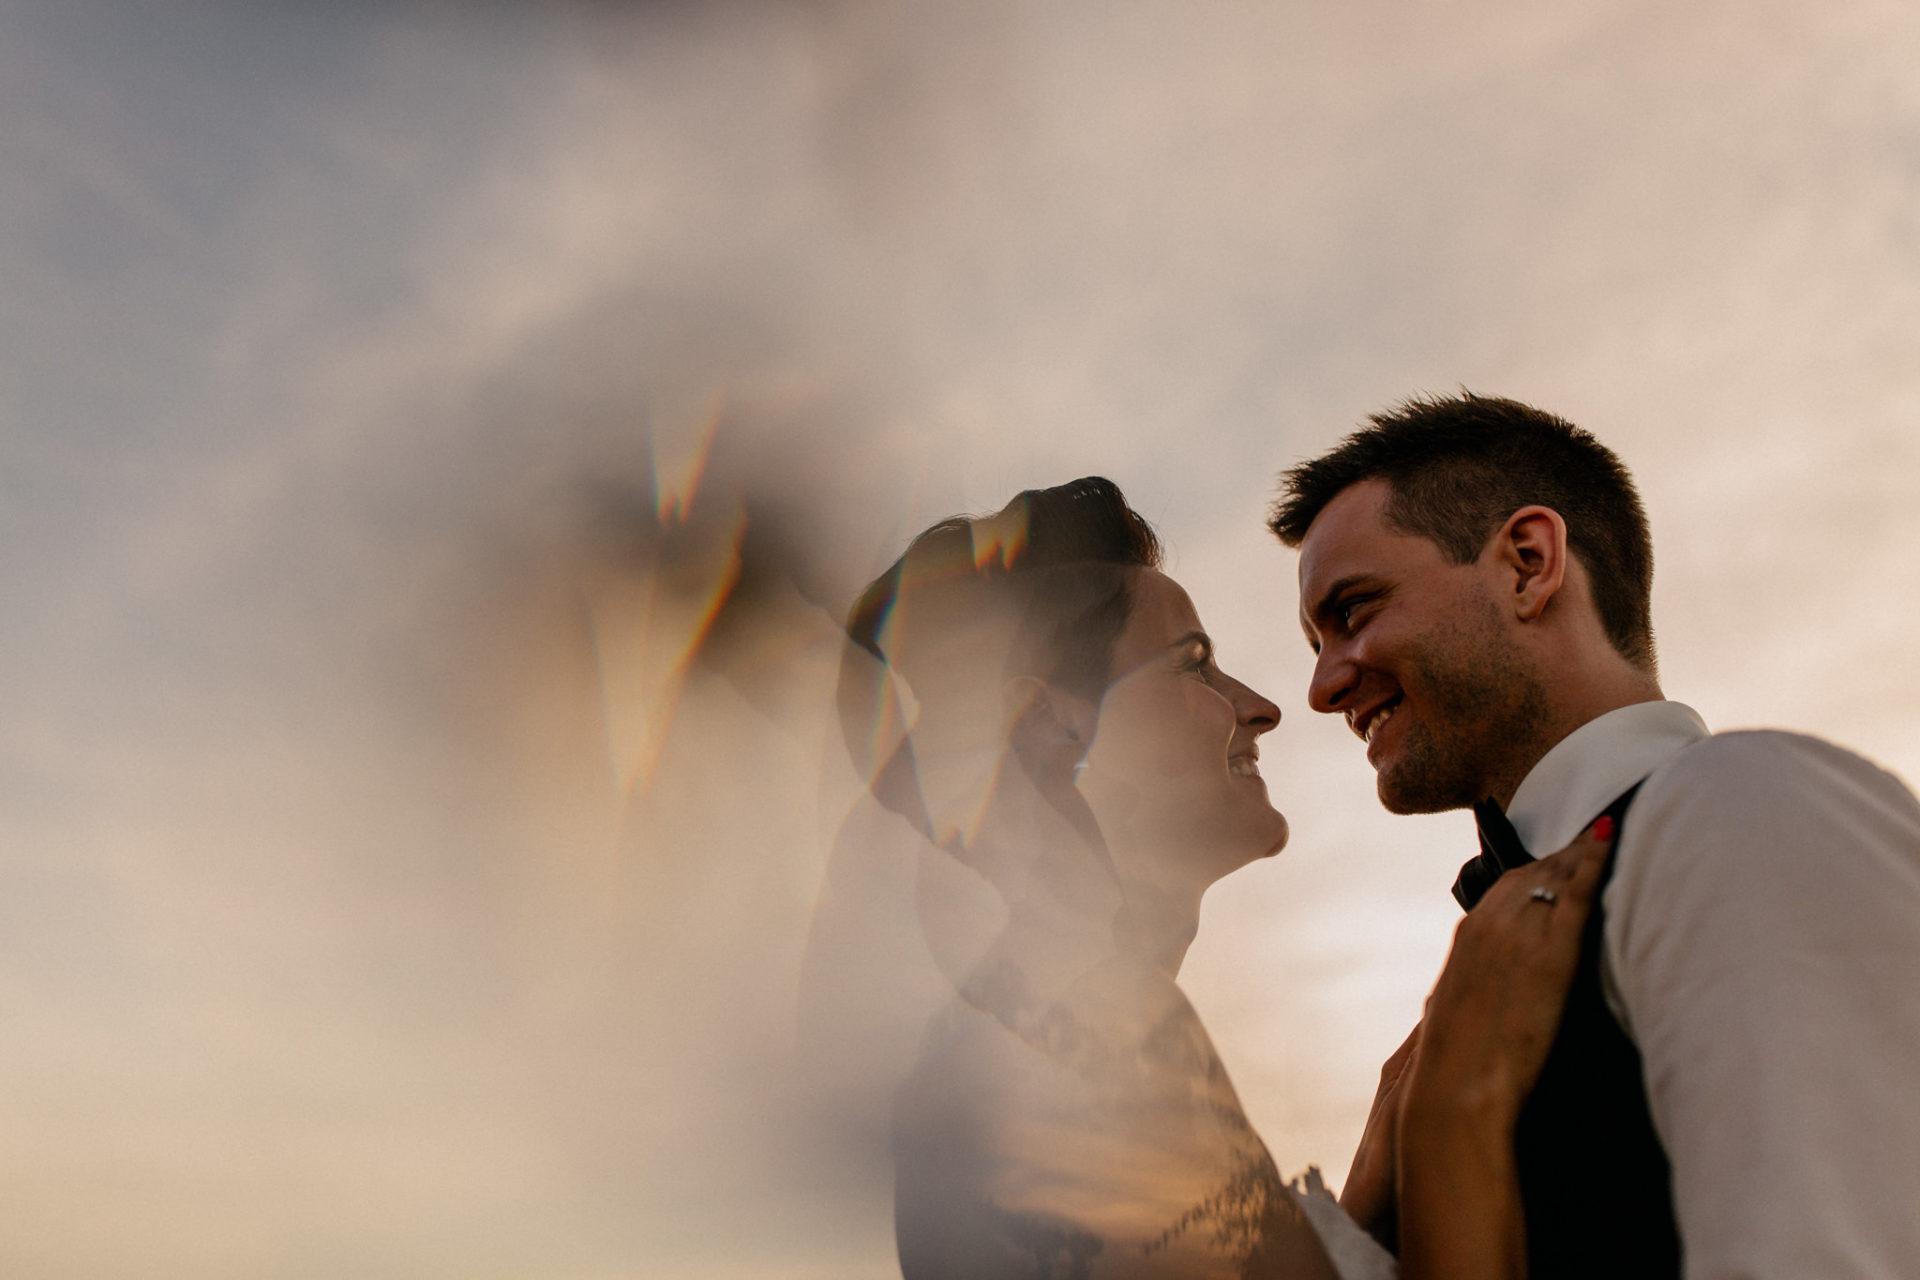 vineyard wedding germany-weingut fitz ritter wedding photographer pfalz bride and groom couple shoot sunset